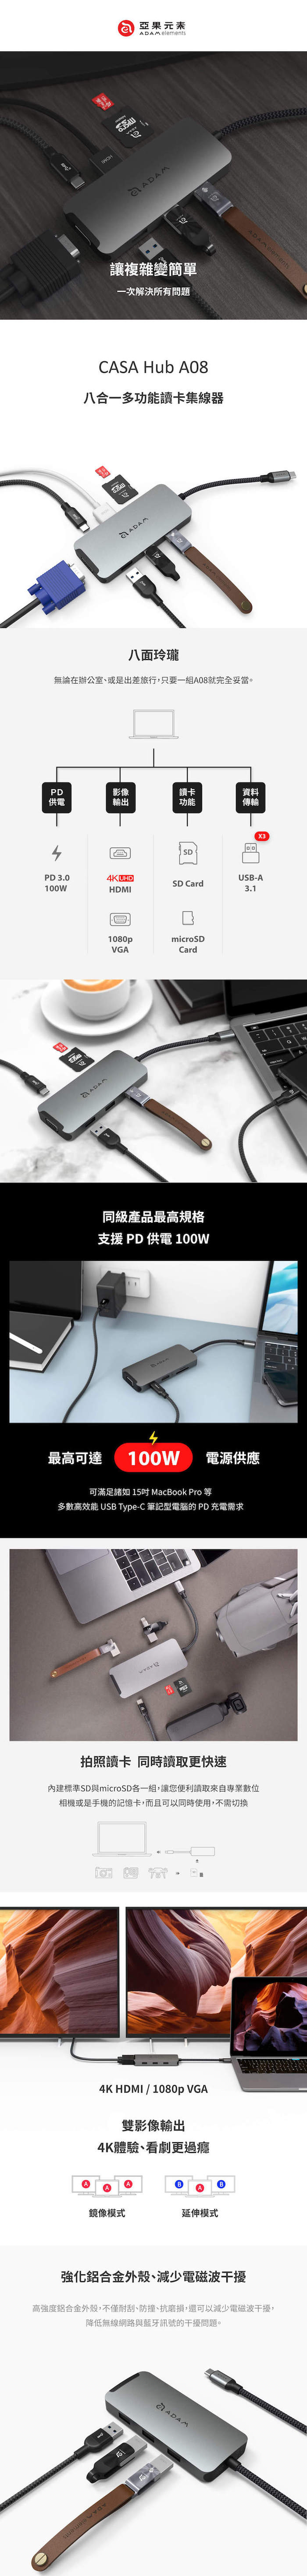 ADAM|Hub A08 USB-C 8 合 1 多功能轉接器